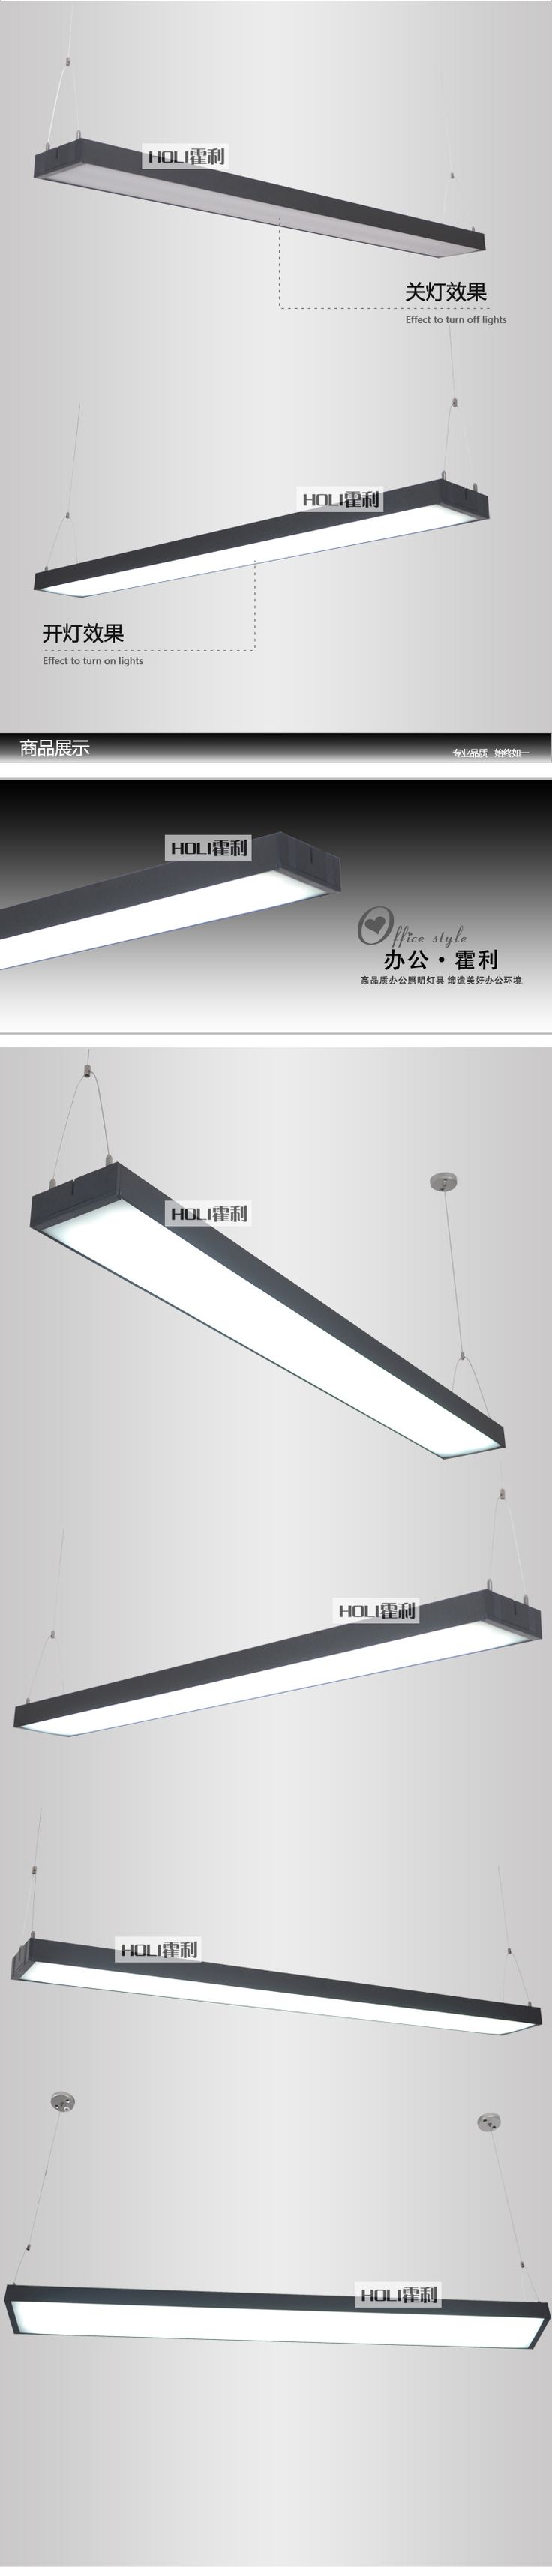 Morden kantoorbenodigdheden t5 buis/led hanglamp lamp opknoping draad lampen…